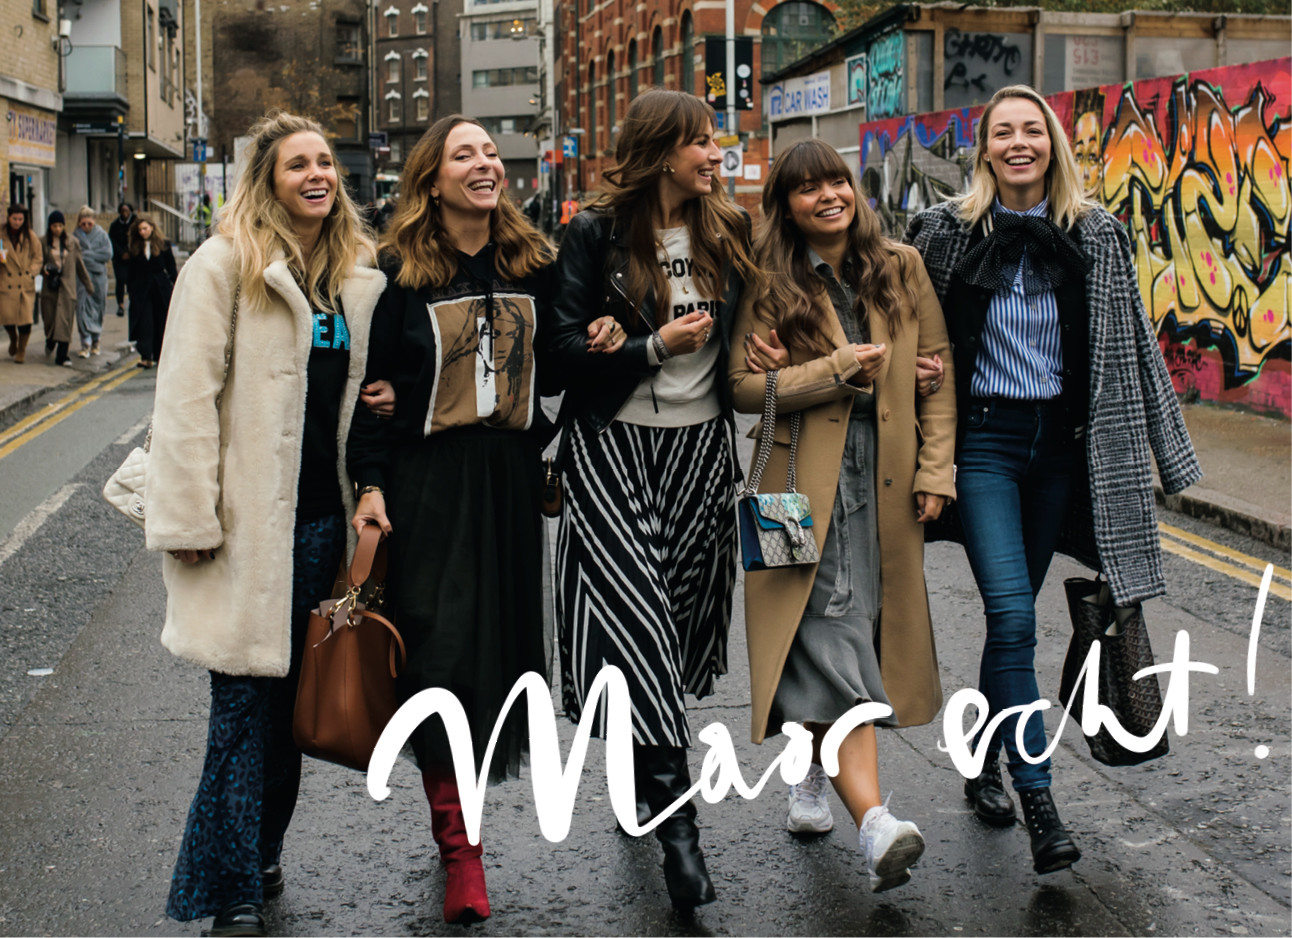 groep vrouwen lopen samen op straat maybritt mobach kiki duren lilian brijl fashion